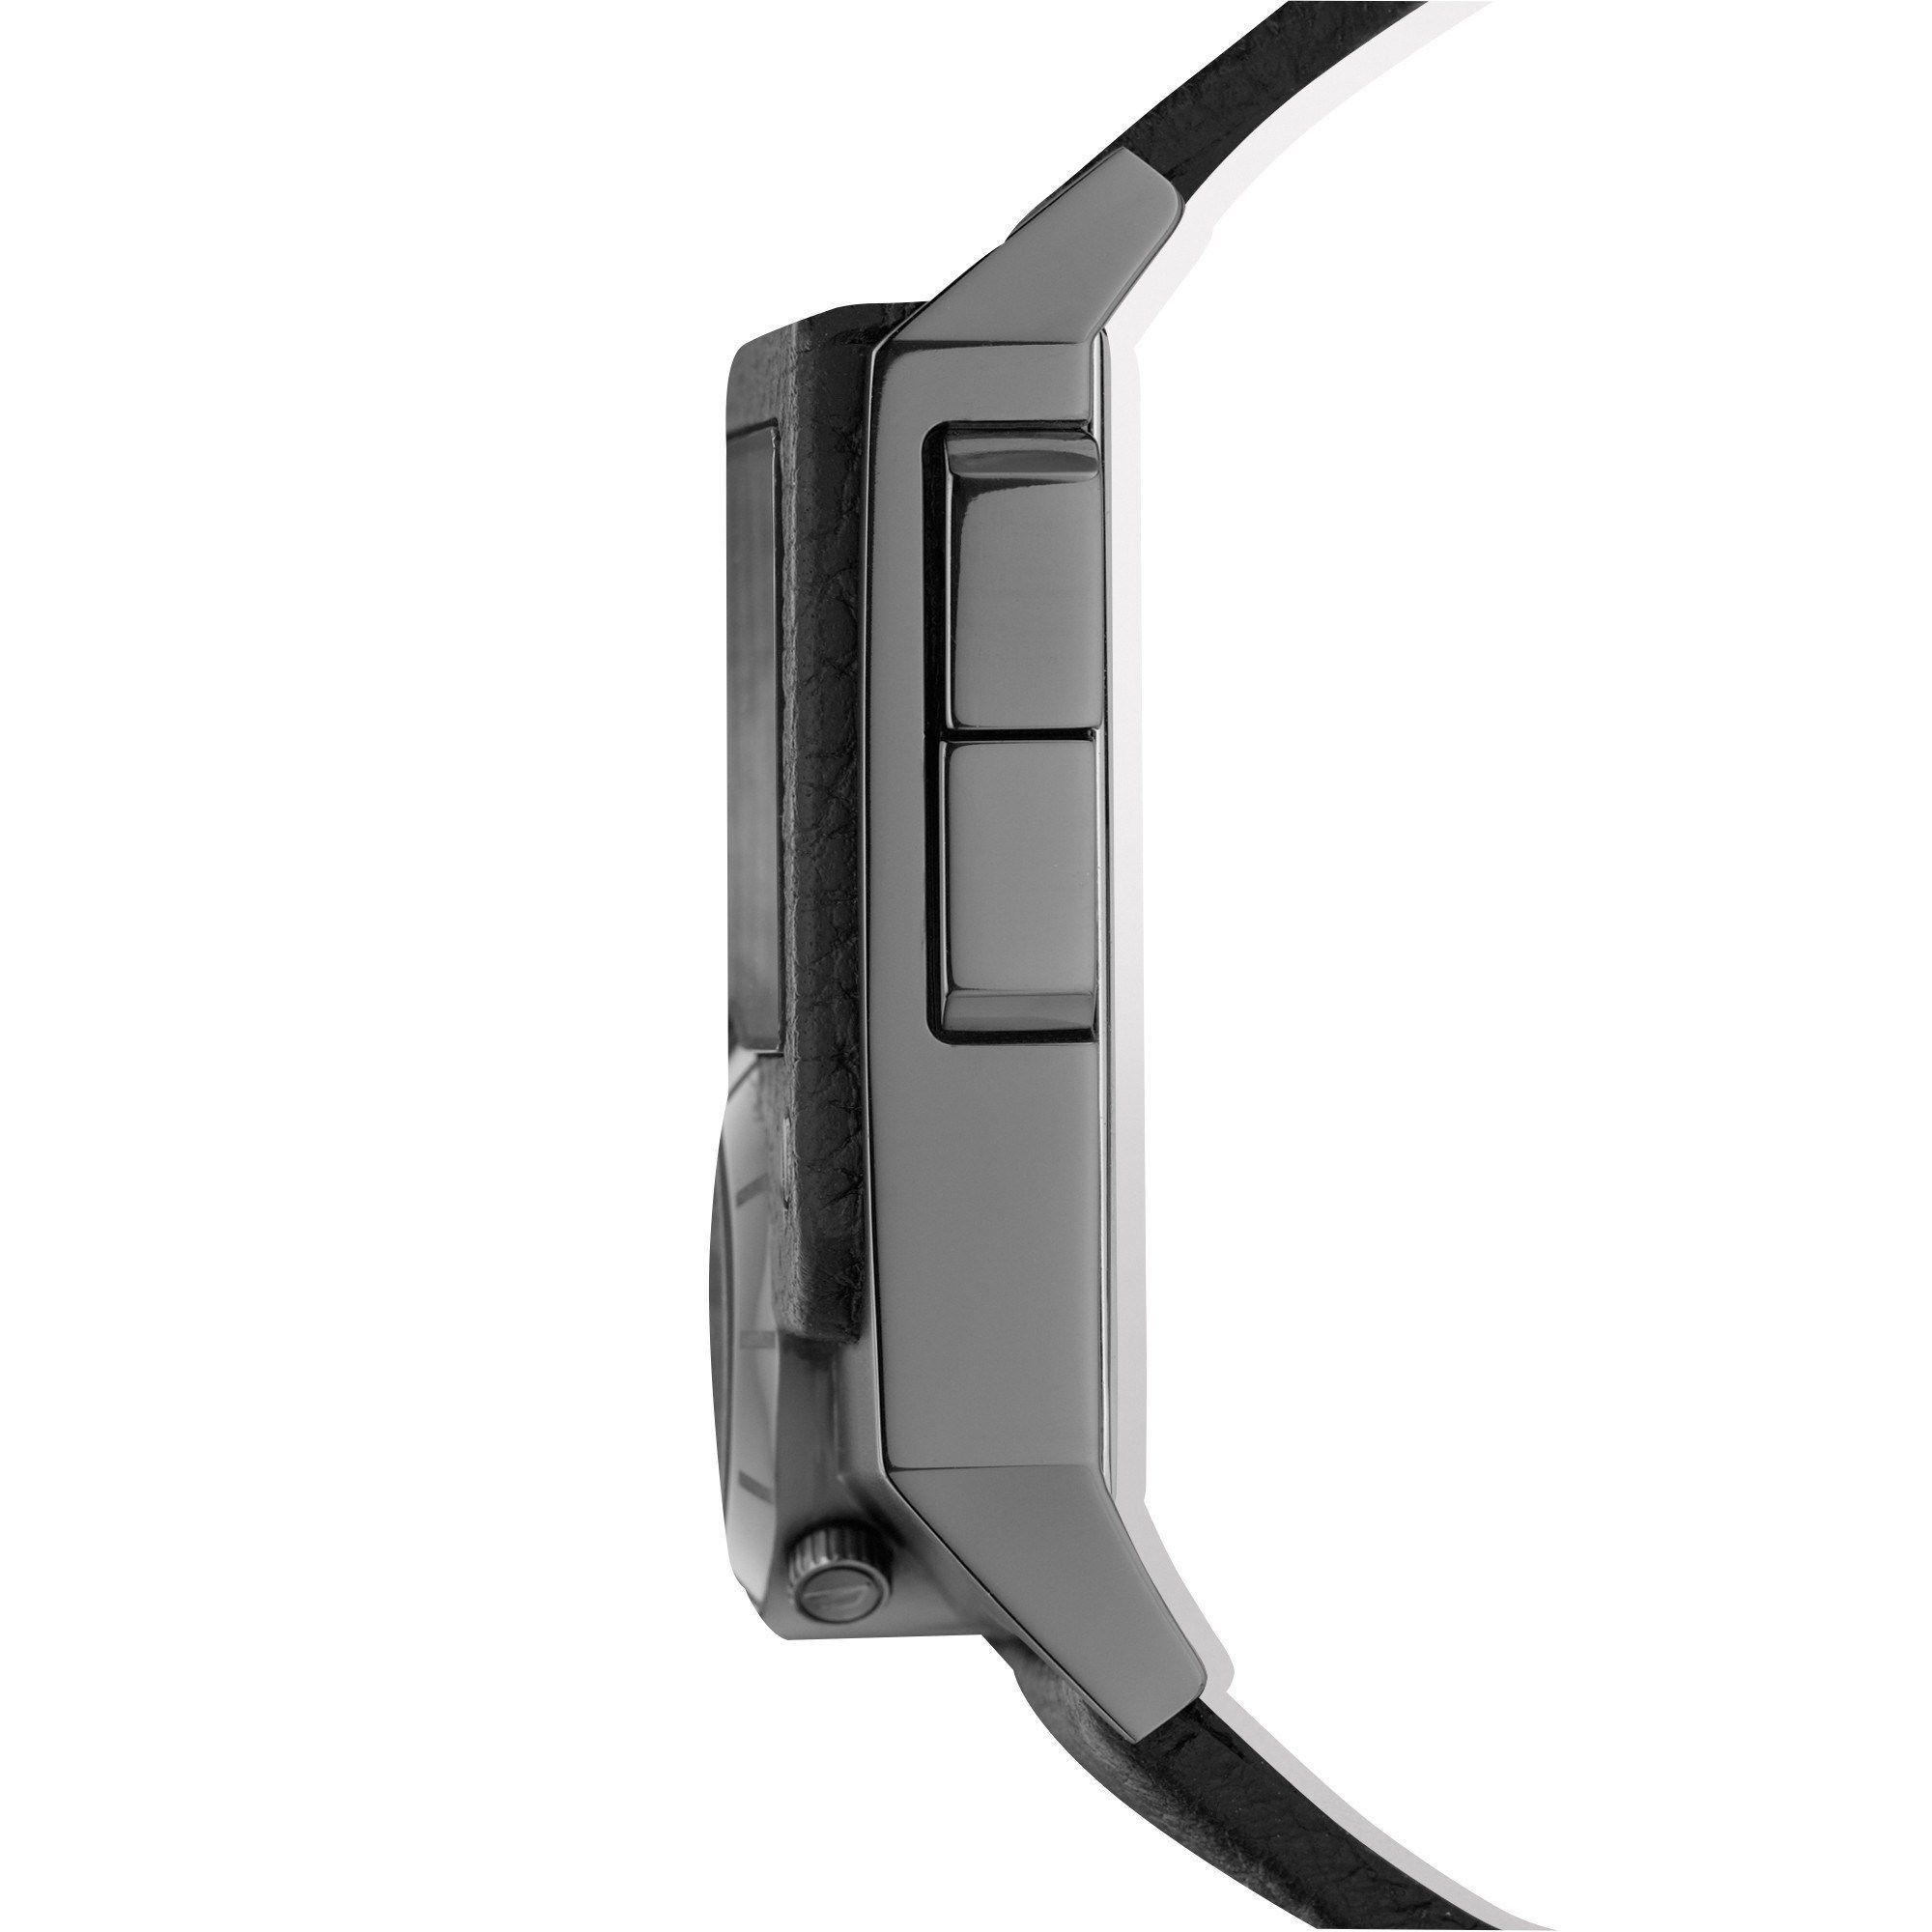 b36b8b050 Shop Diesel Men's DZ7231 'SBA Blackout' Digital Black Leather Watch - Free  Shipping Today - Overstock - 10561713